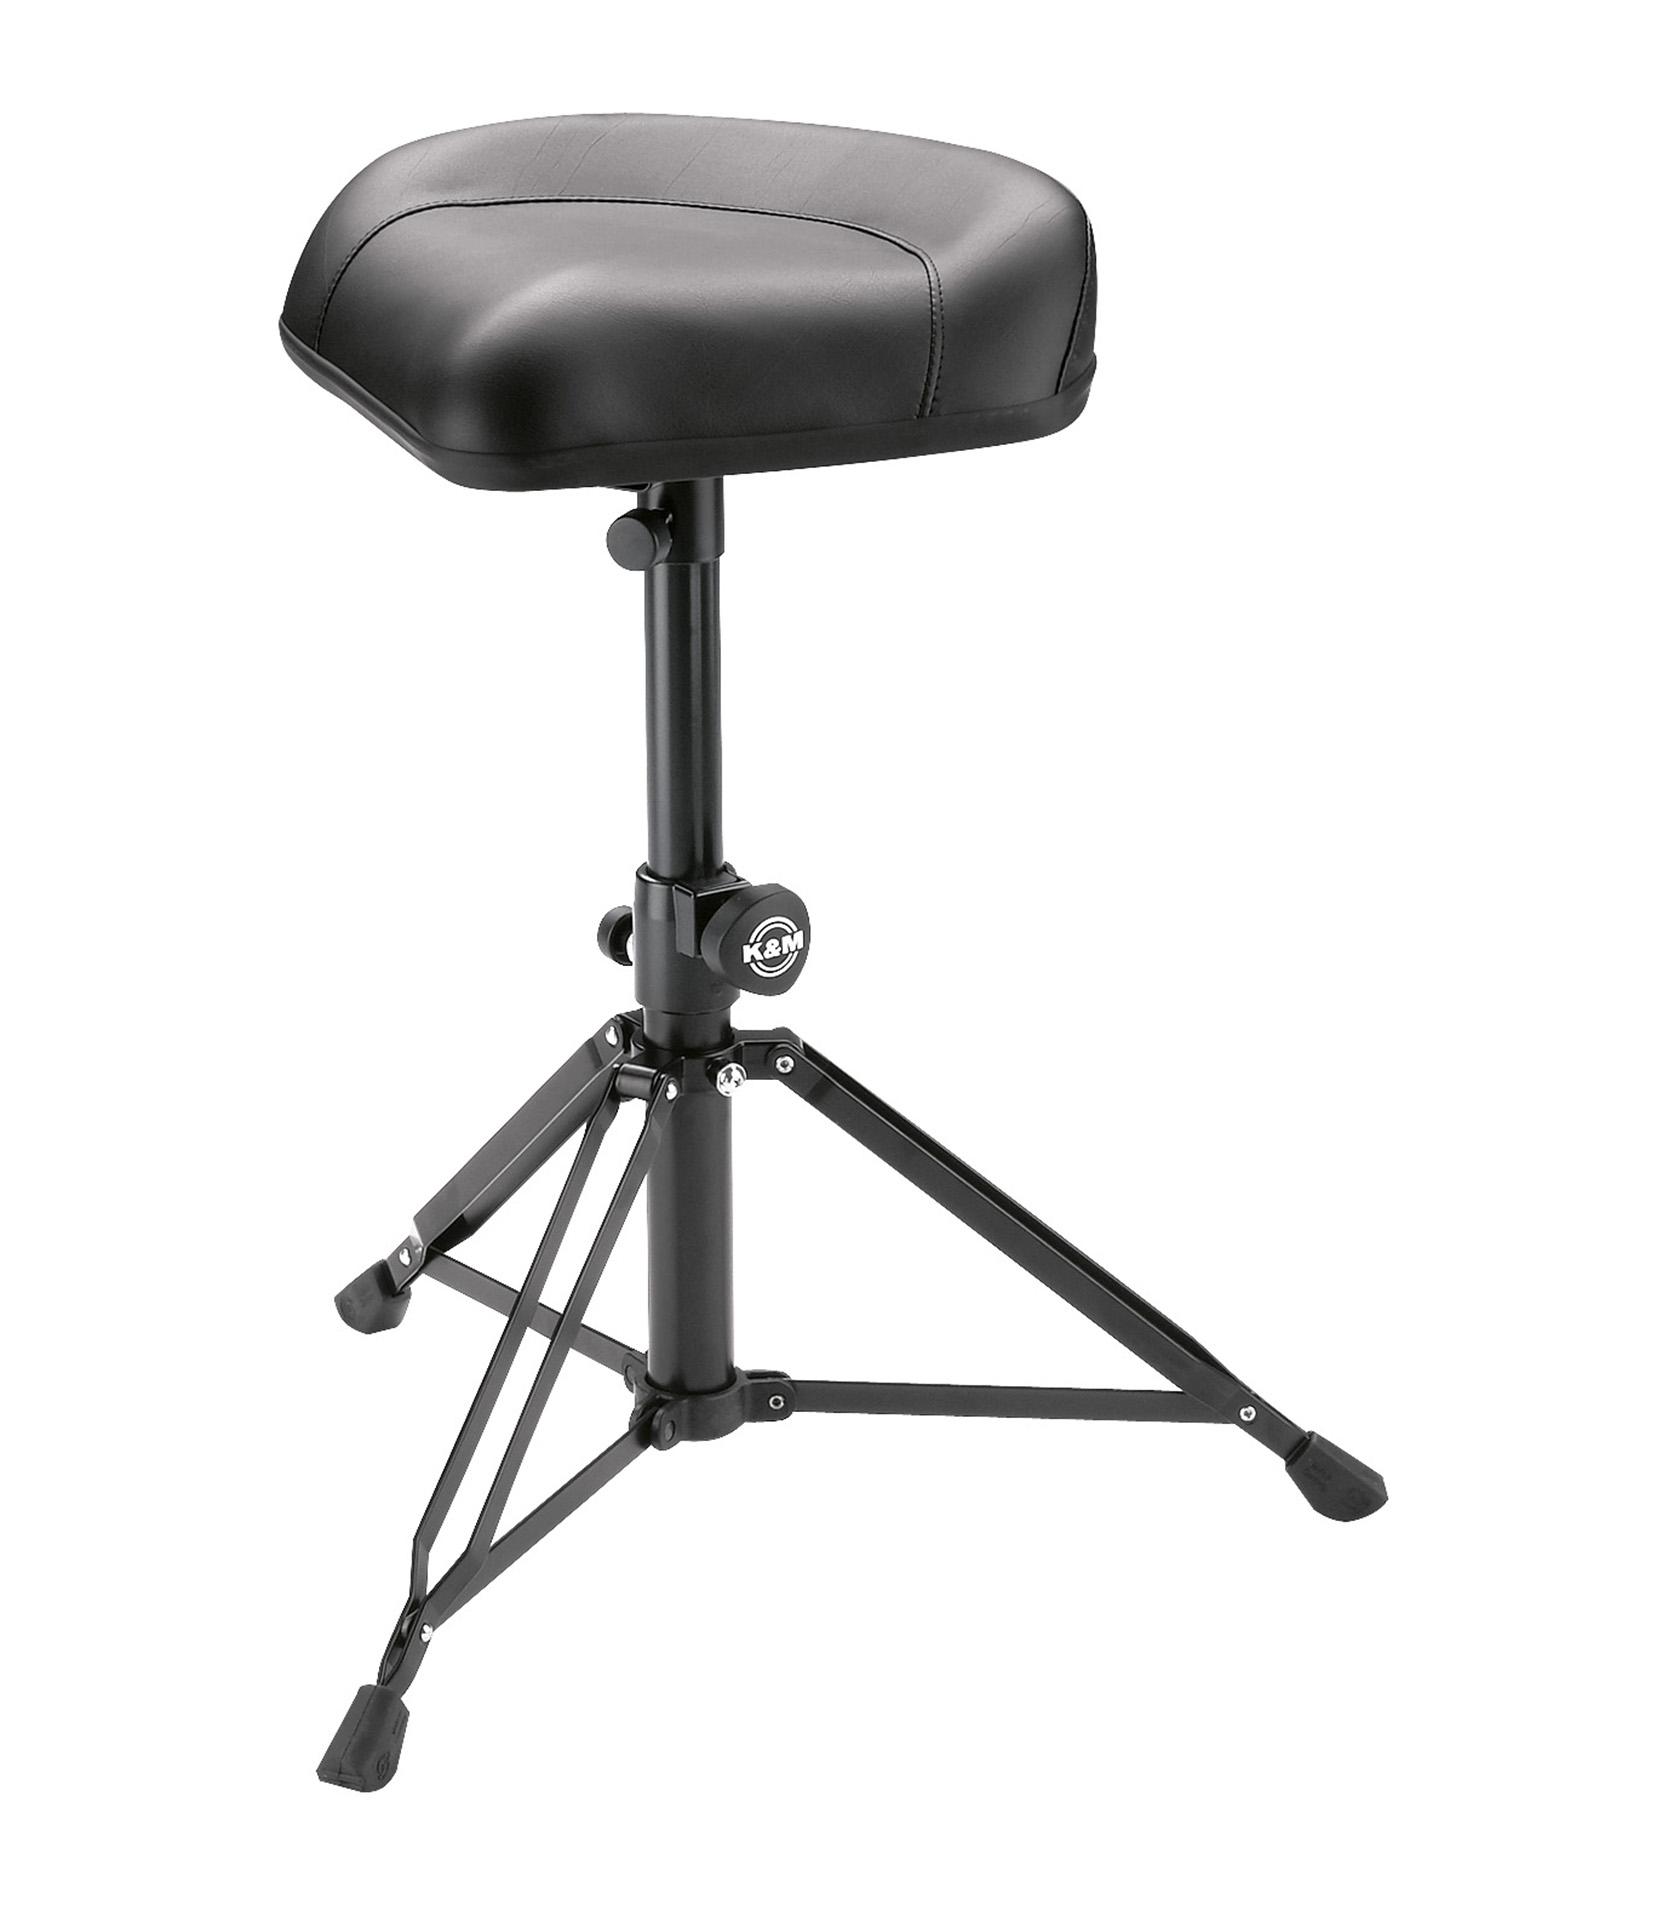 Buy K&M - 14055 000 55 Drummers throne Nick black leather